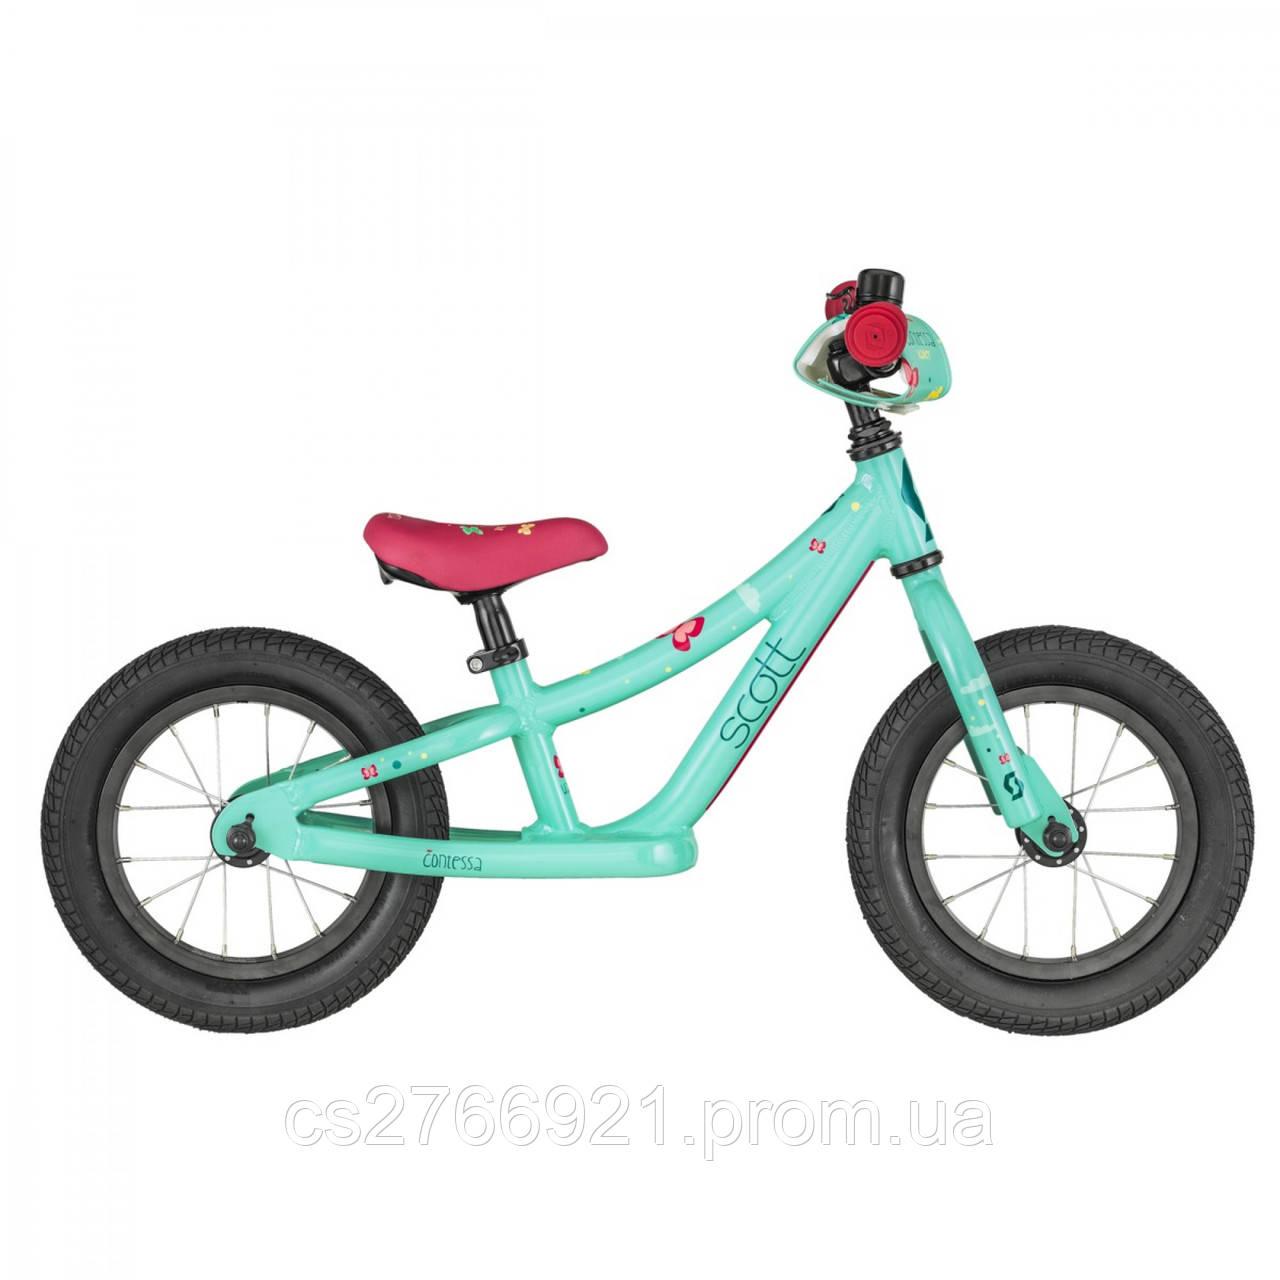 Велосипед SCOTT Contessa Walker 19